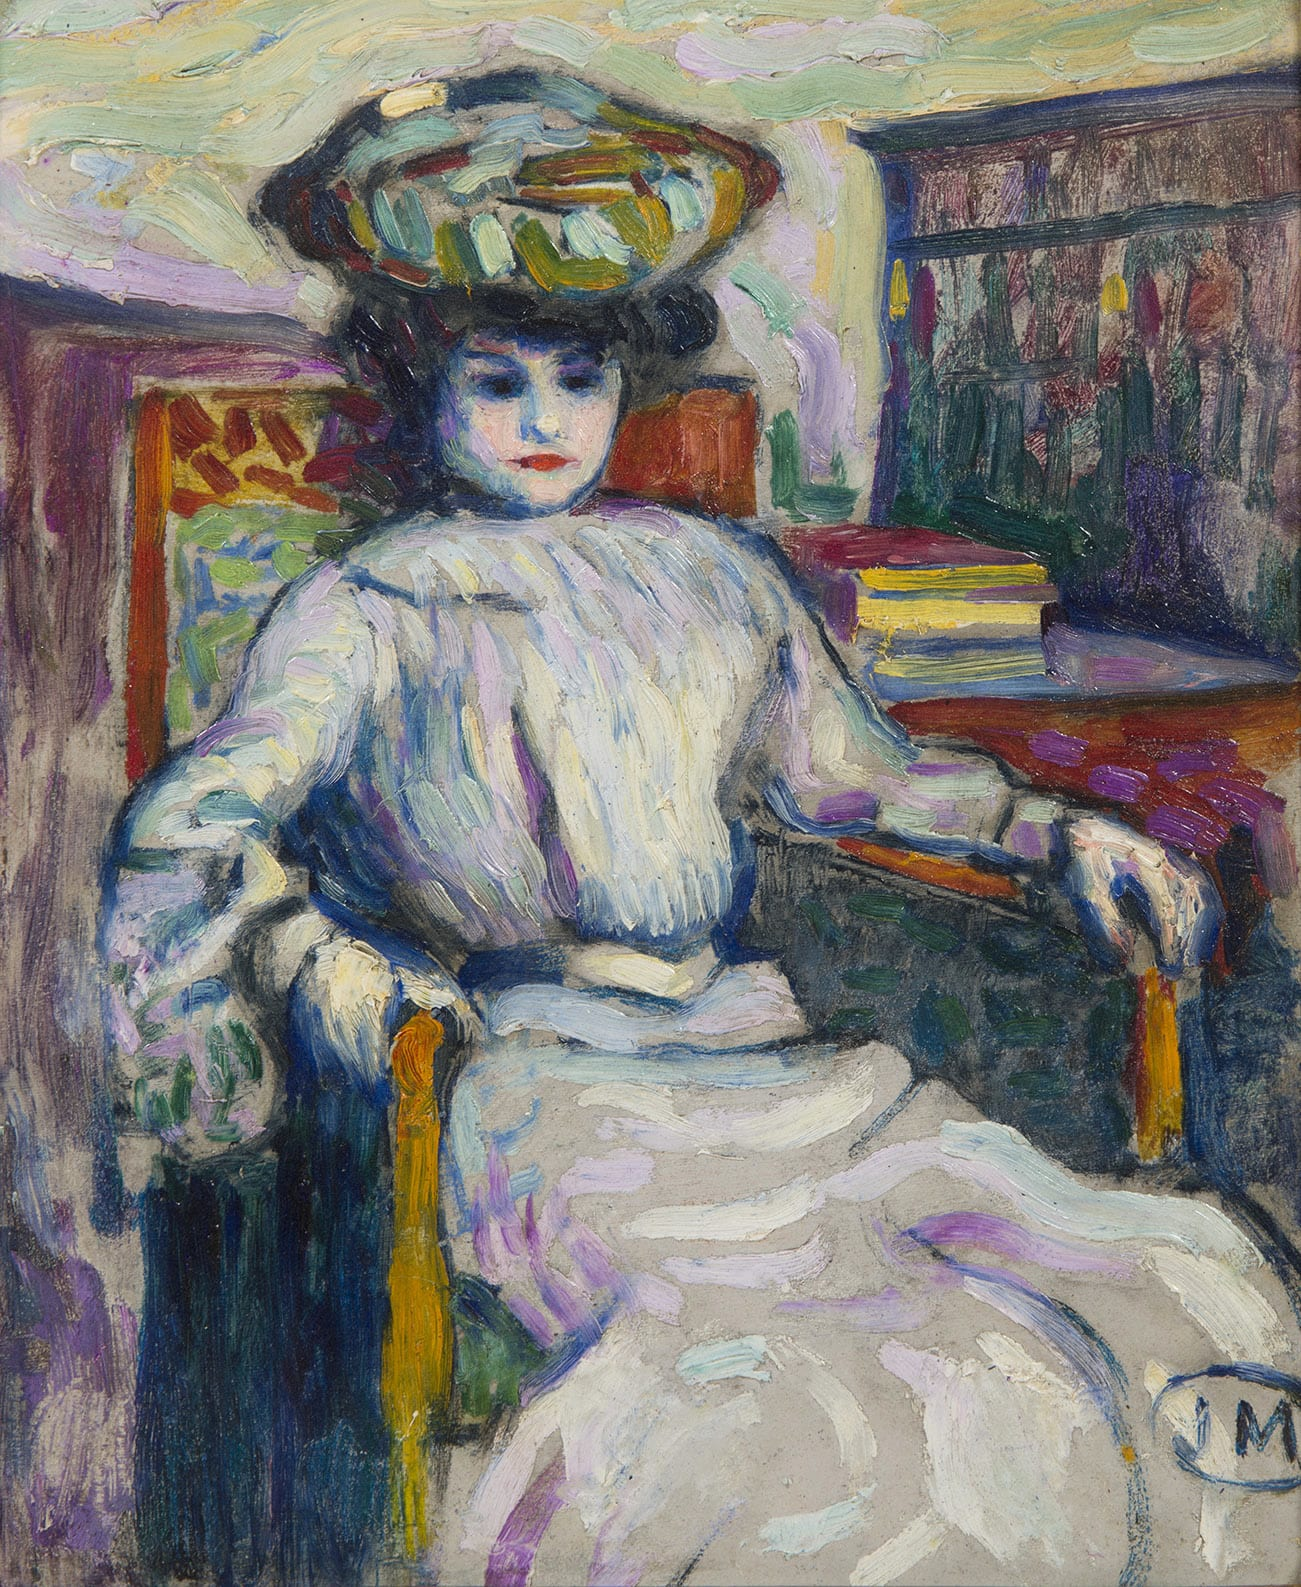 JEAN METZINGER, Femme assise, circa 1906